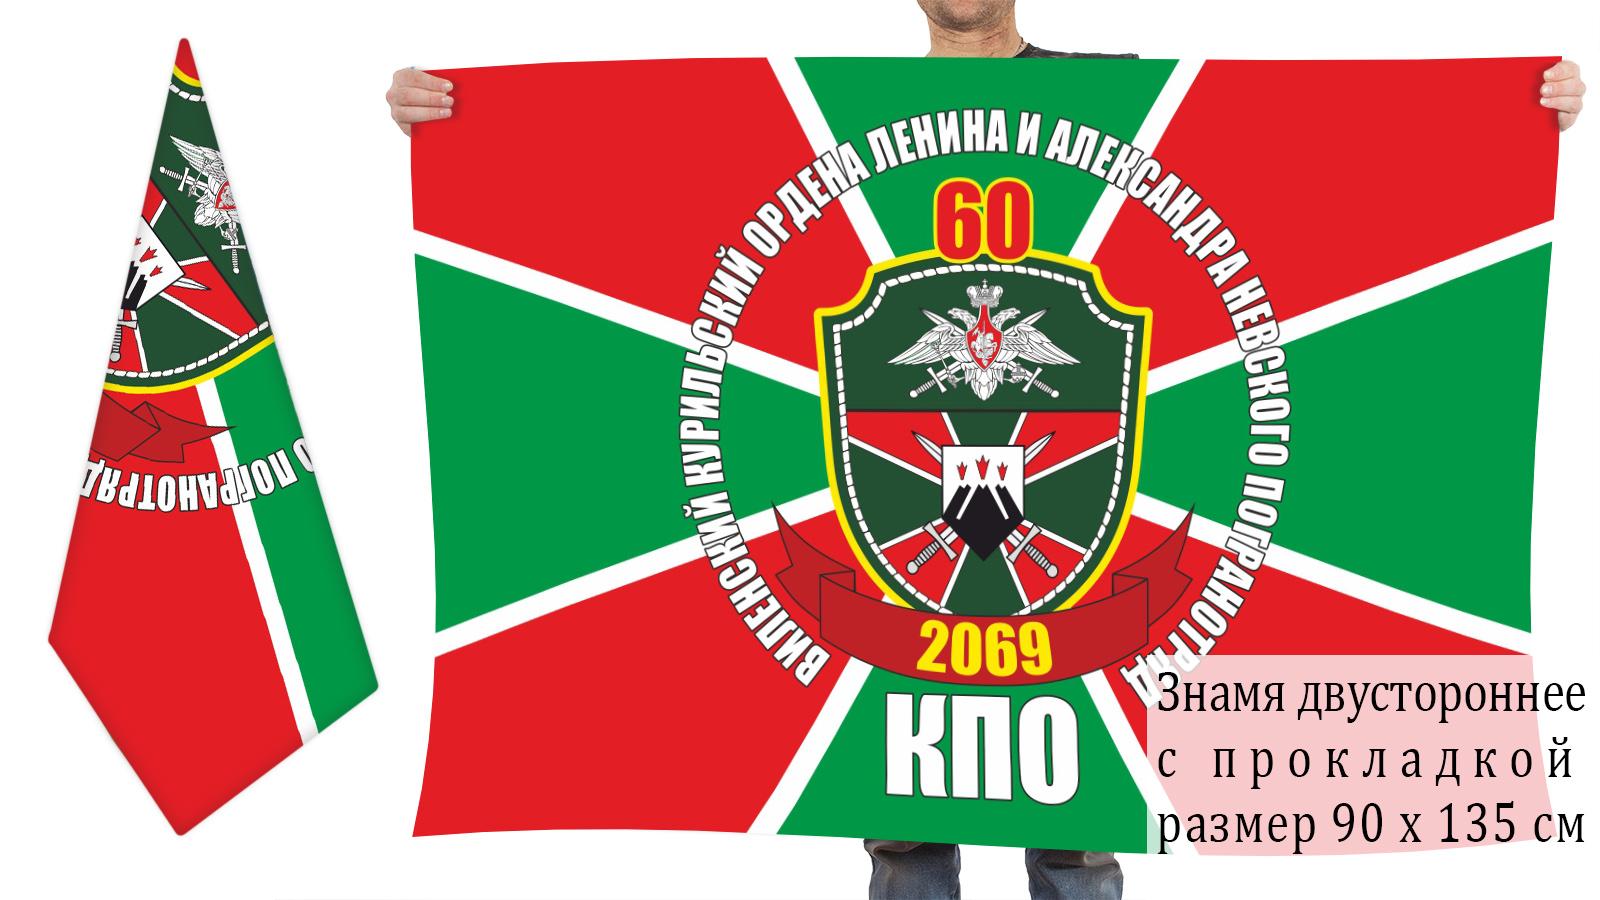 Двусторонний флаг 60 ордена Ленина и Александра Невского погранотряда